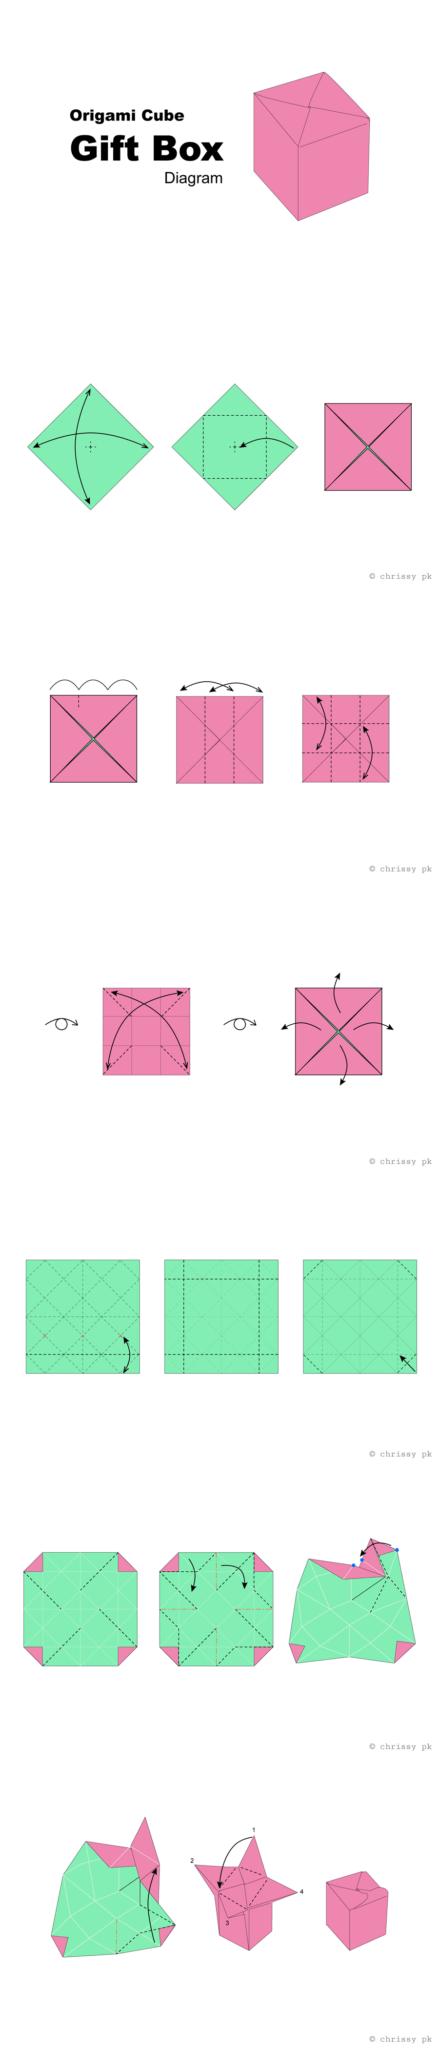 Swell Origami Diagrams Paper Kawaii Wiring Digital Resources Honesemecshebarightsorg